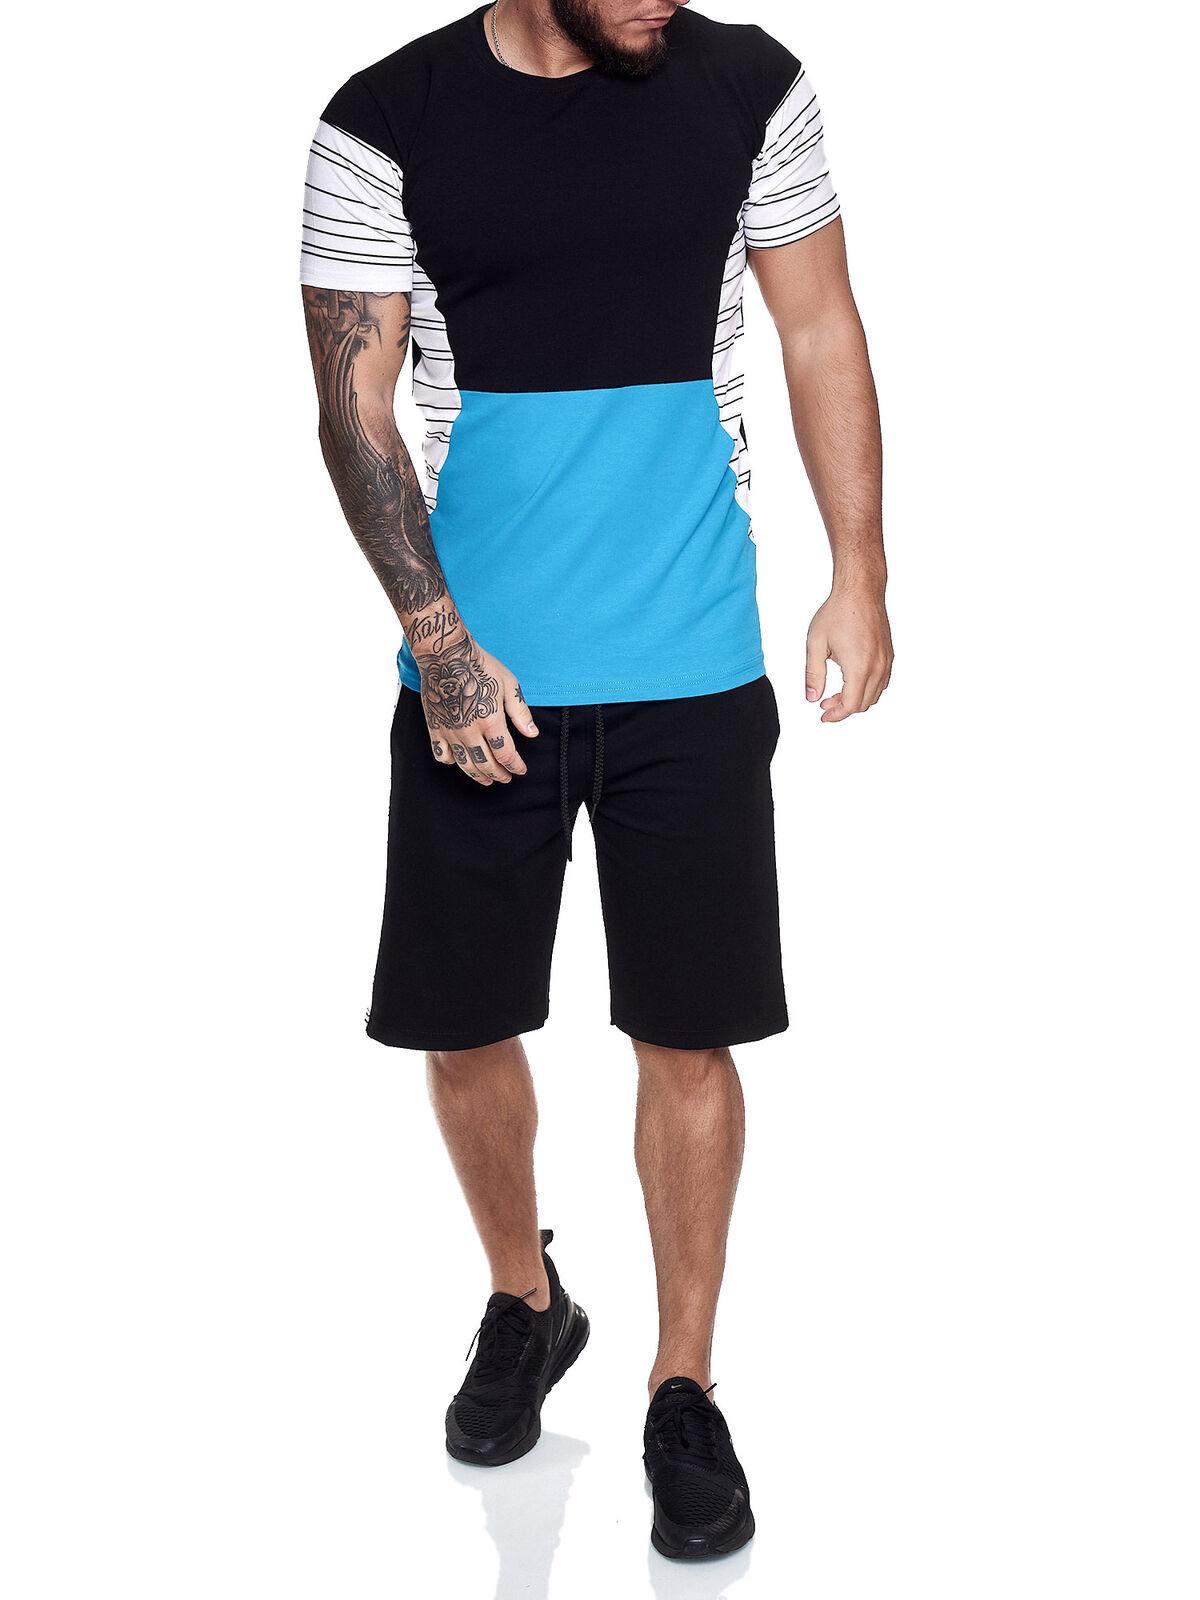 short-Jogginganzug Tracksuit Shortanzug Trackies Shorts T-Shirt